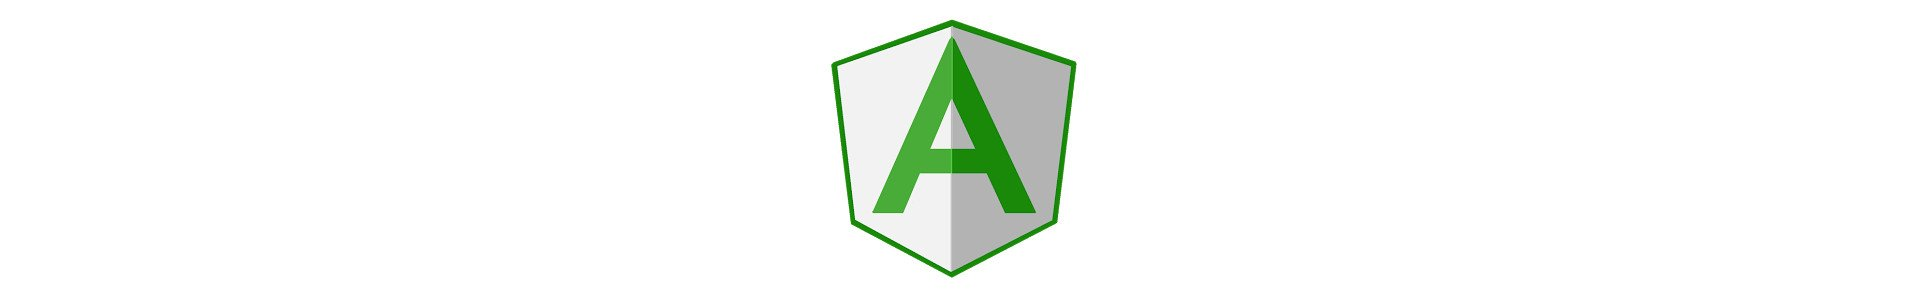 Angular Light logo